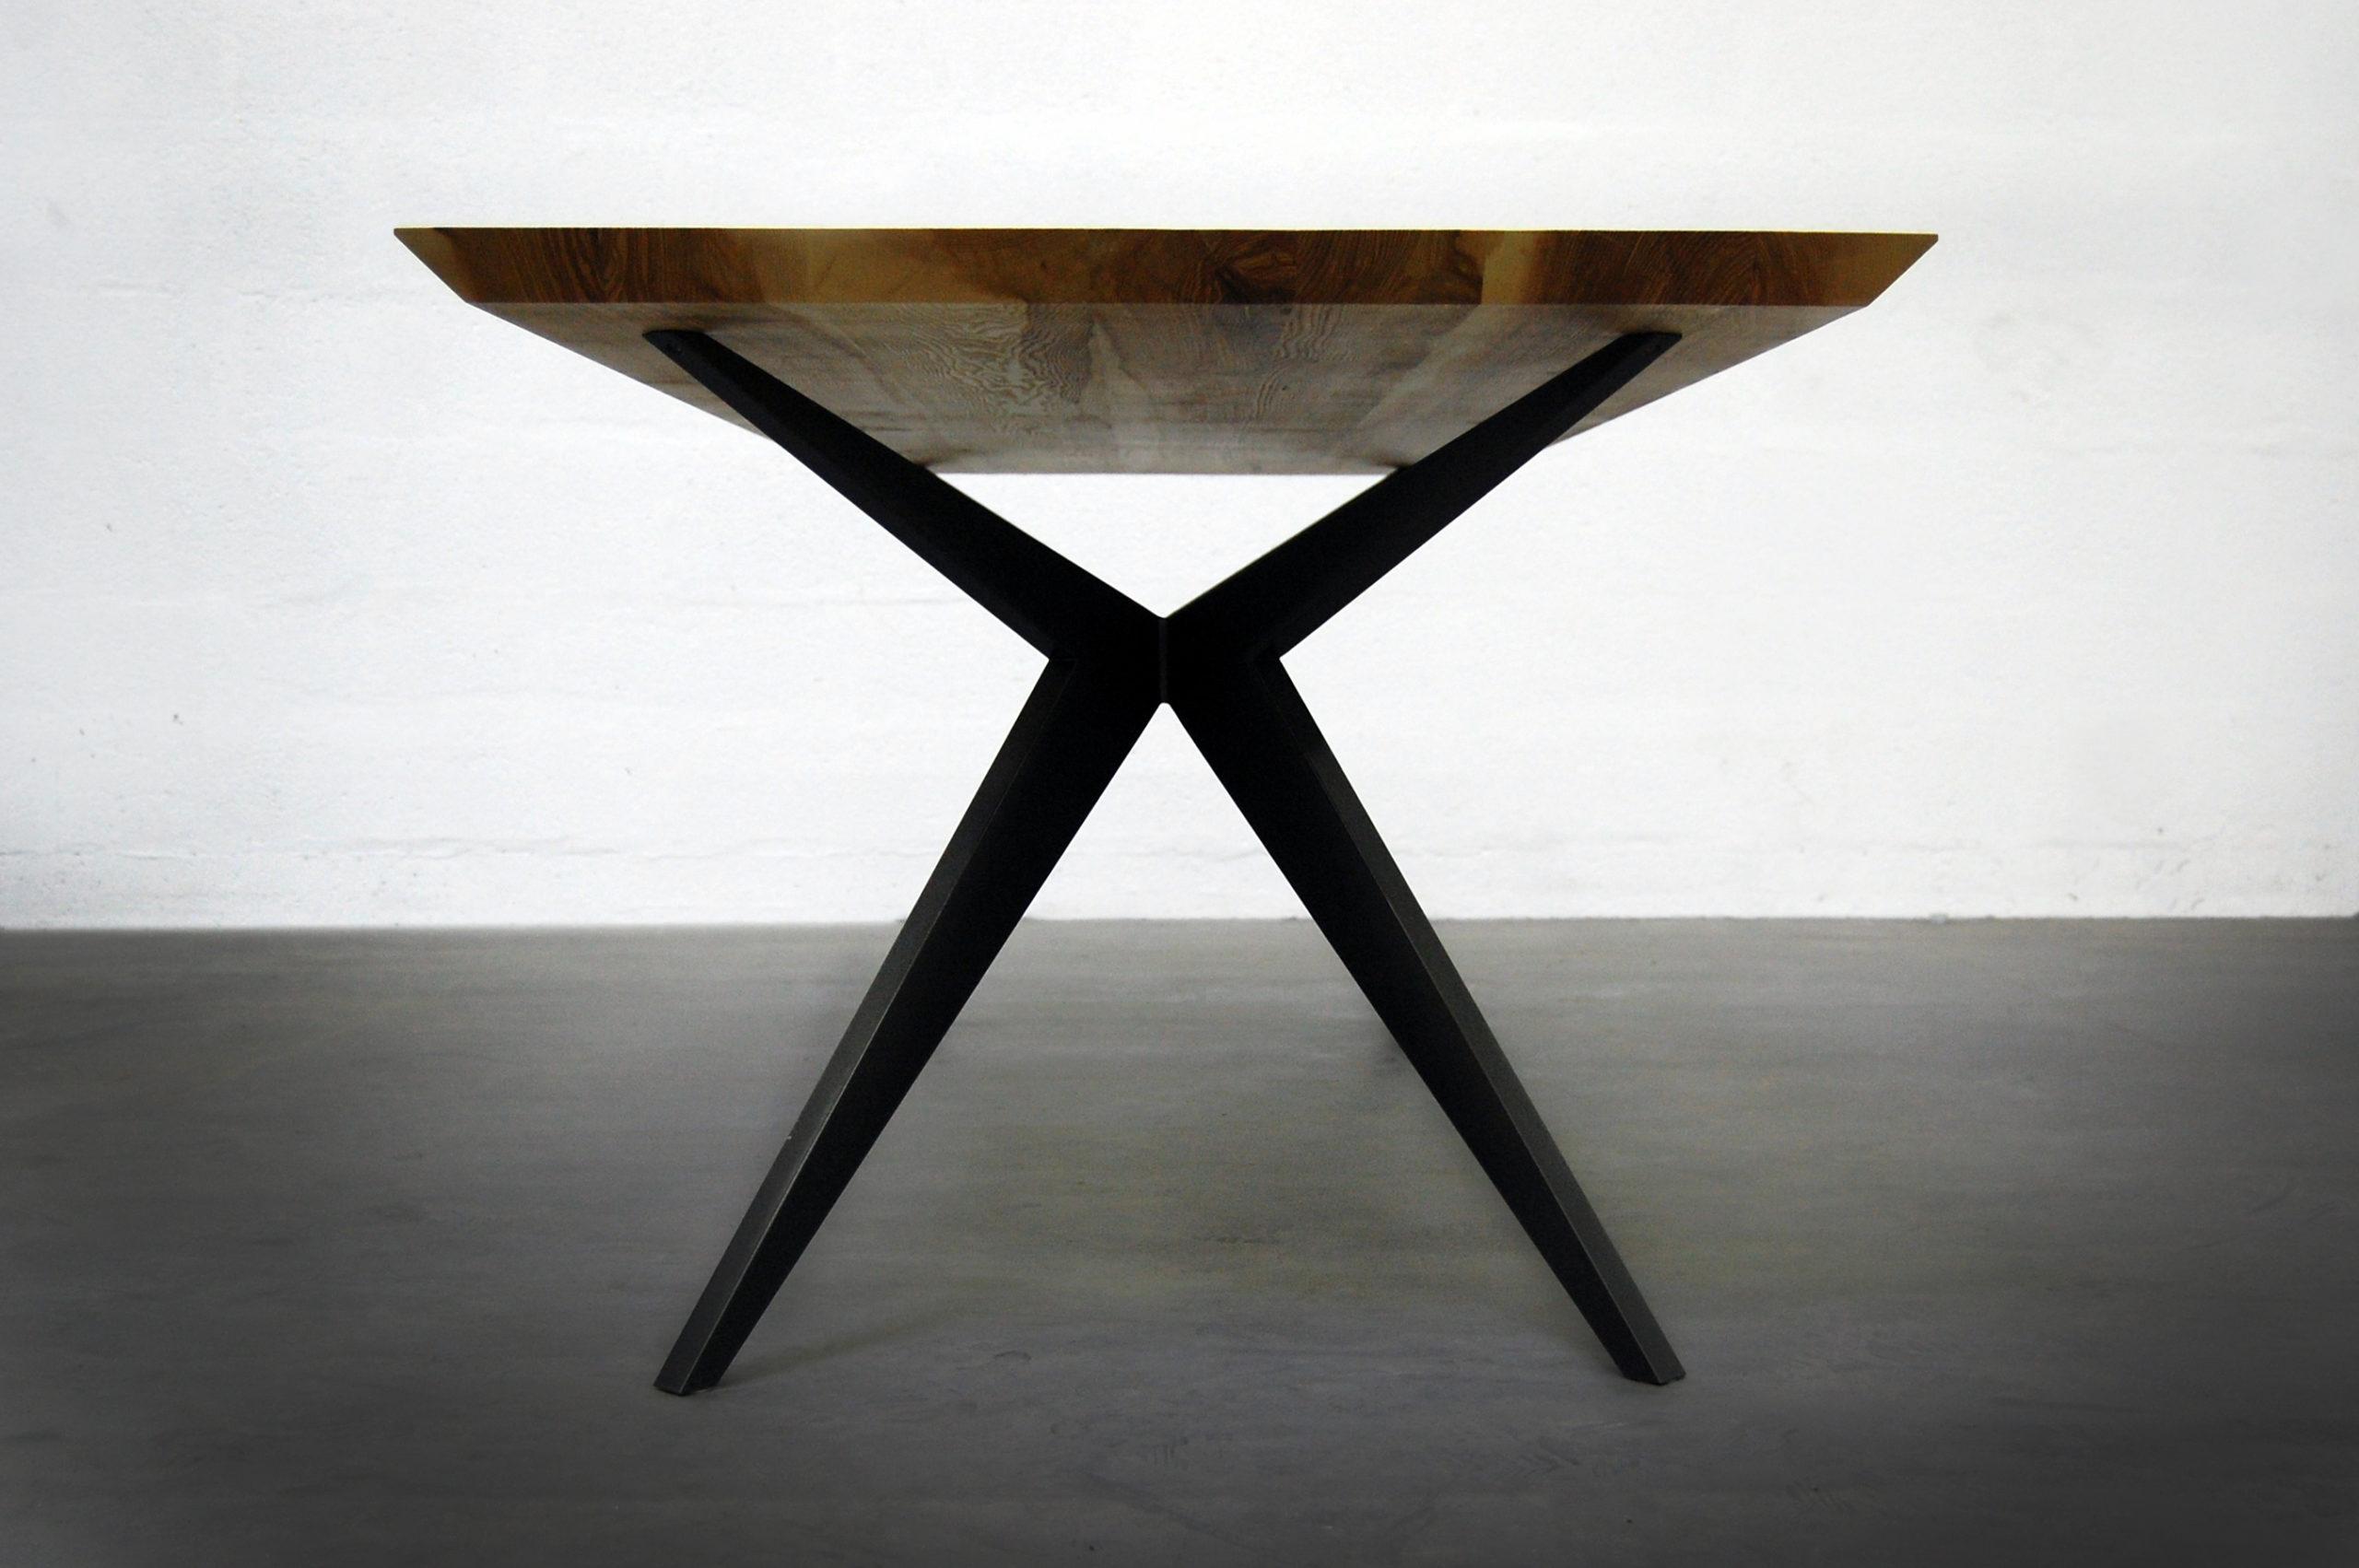 Artmeta : fabrication de tables sur mesure